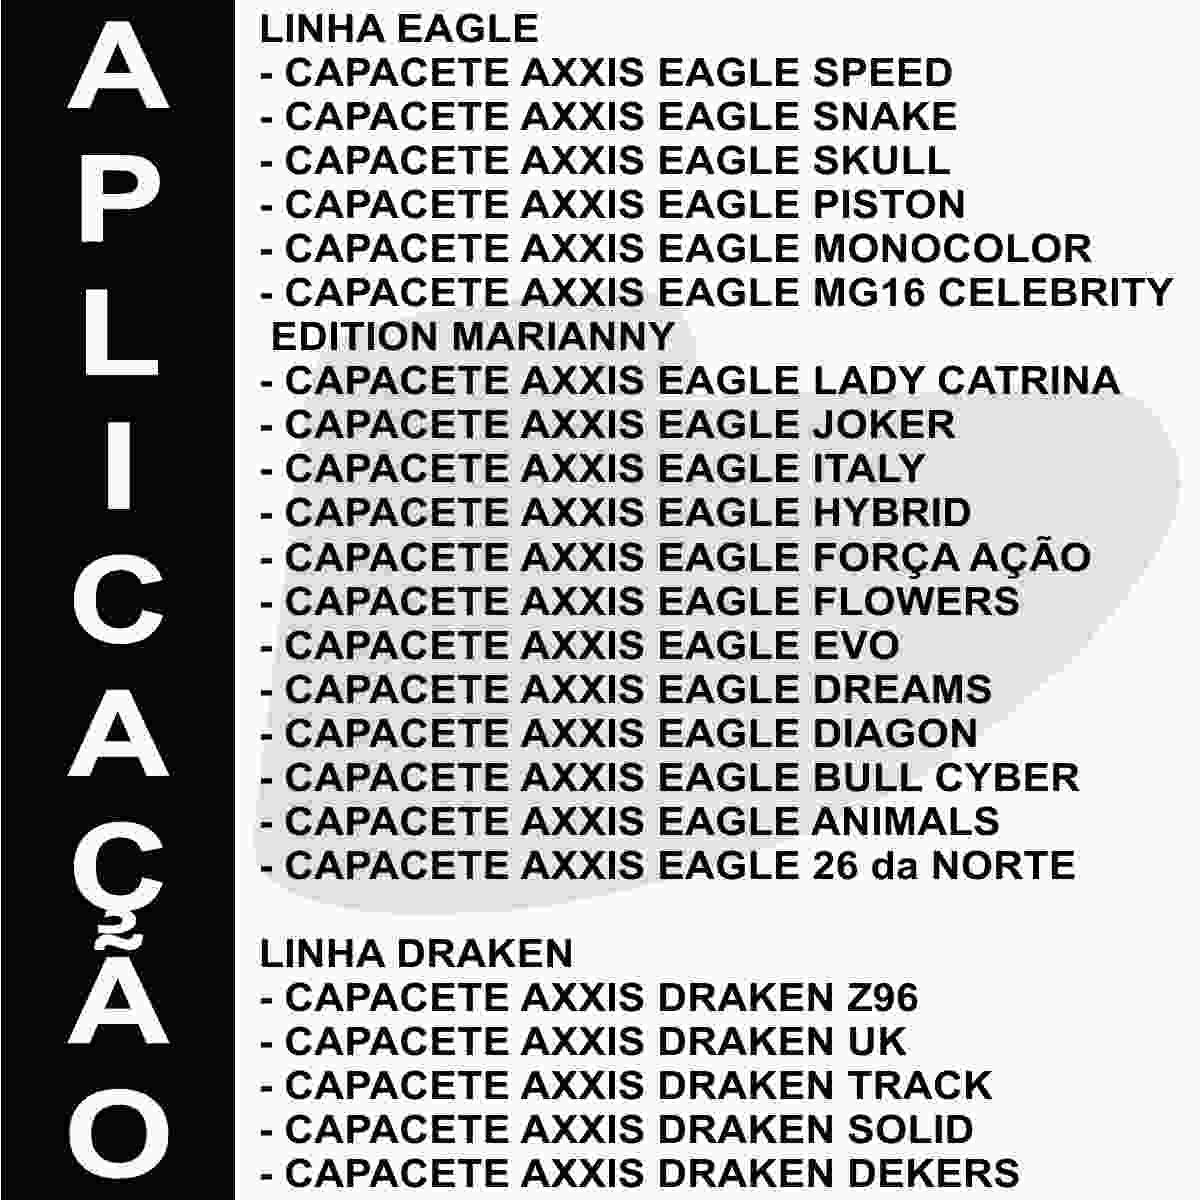 KIT VISEIRA AXXIS EAGLE/DRAKEN SILVER PRATA V18 + SISTEMA DE RETENÇÃO DE VISEIRA